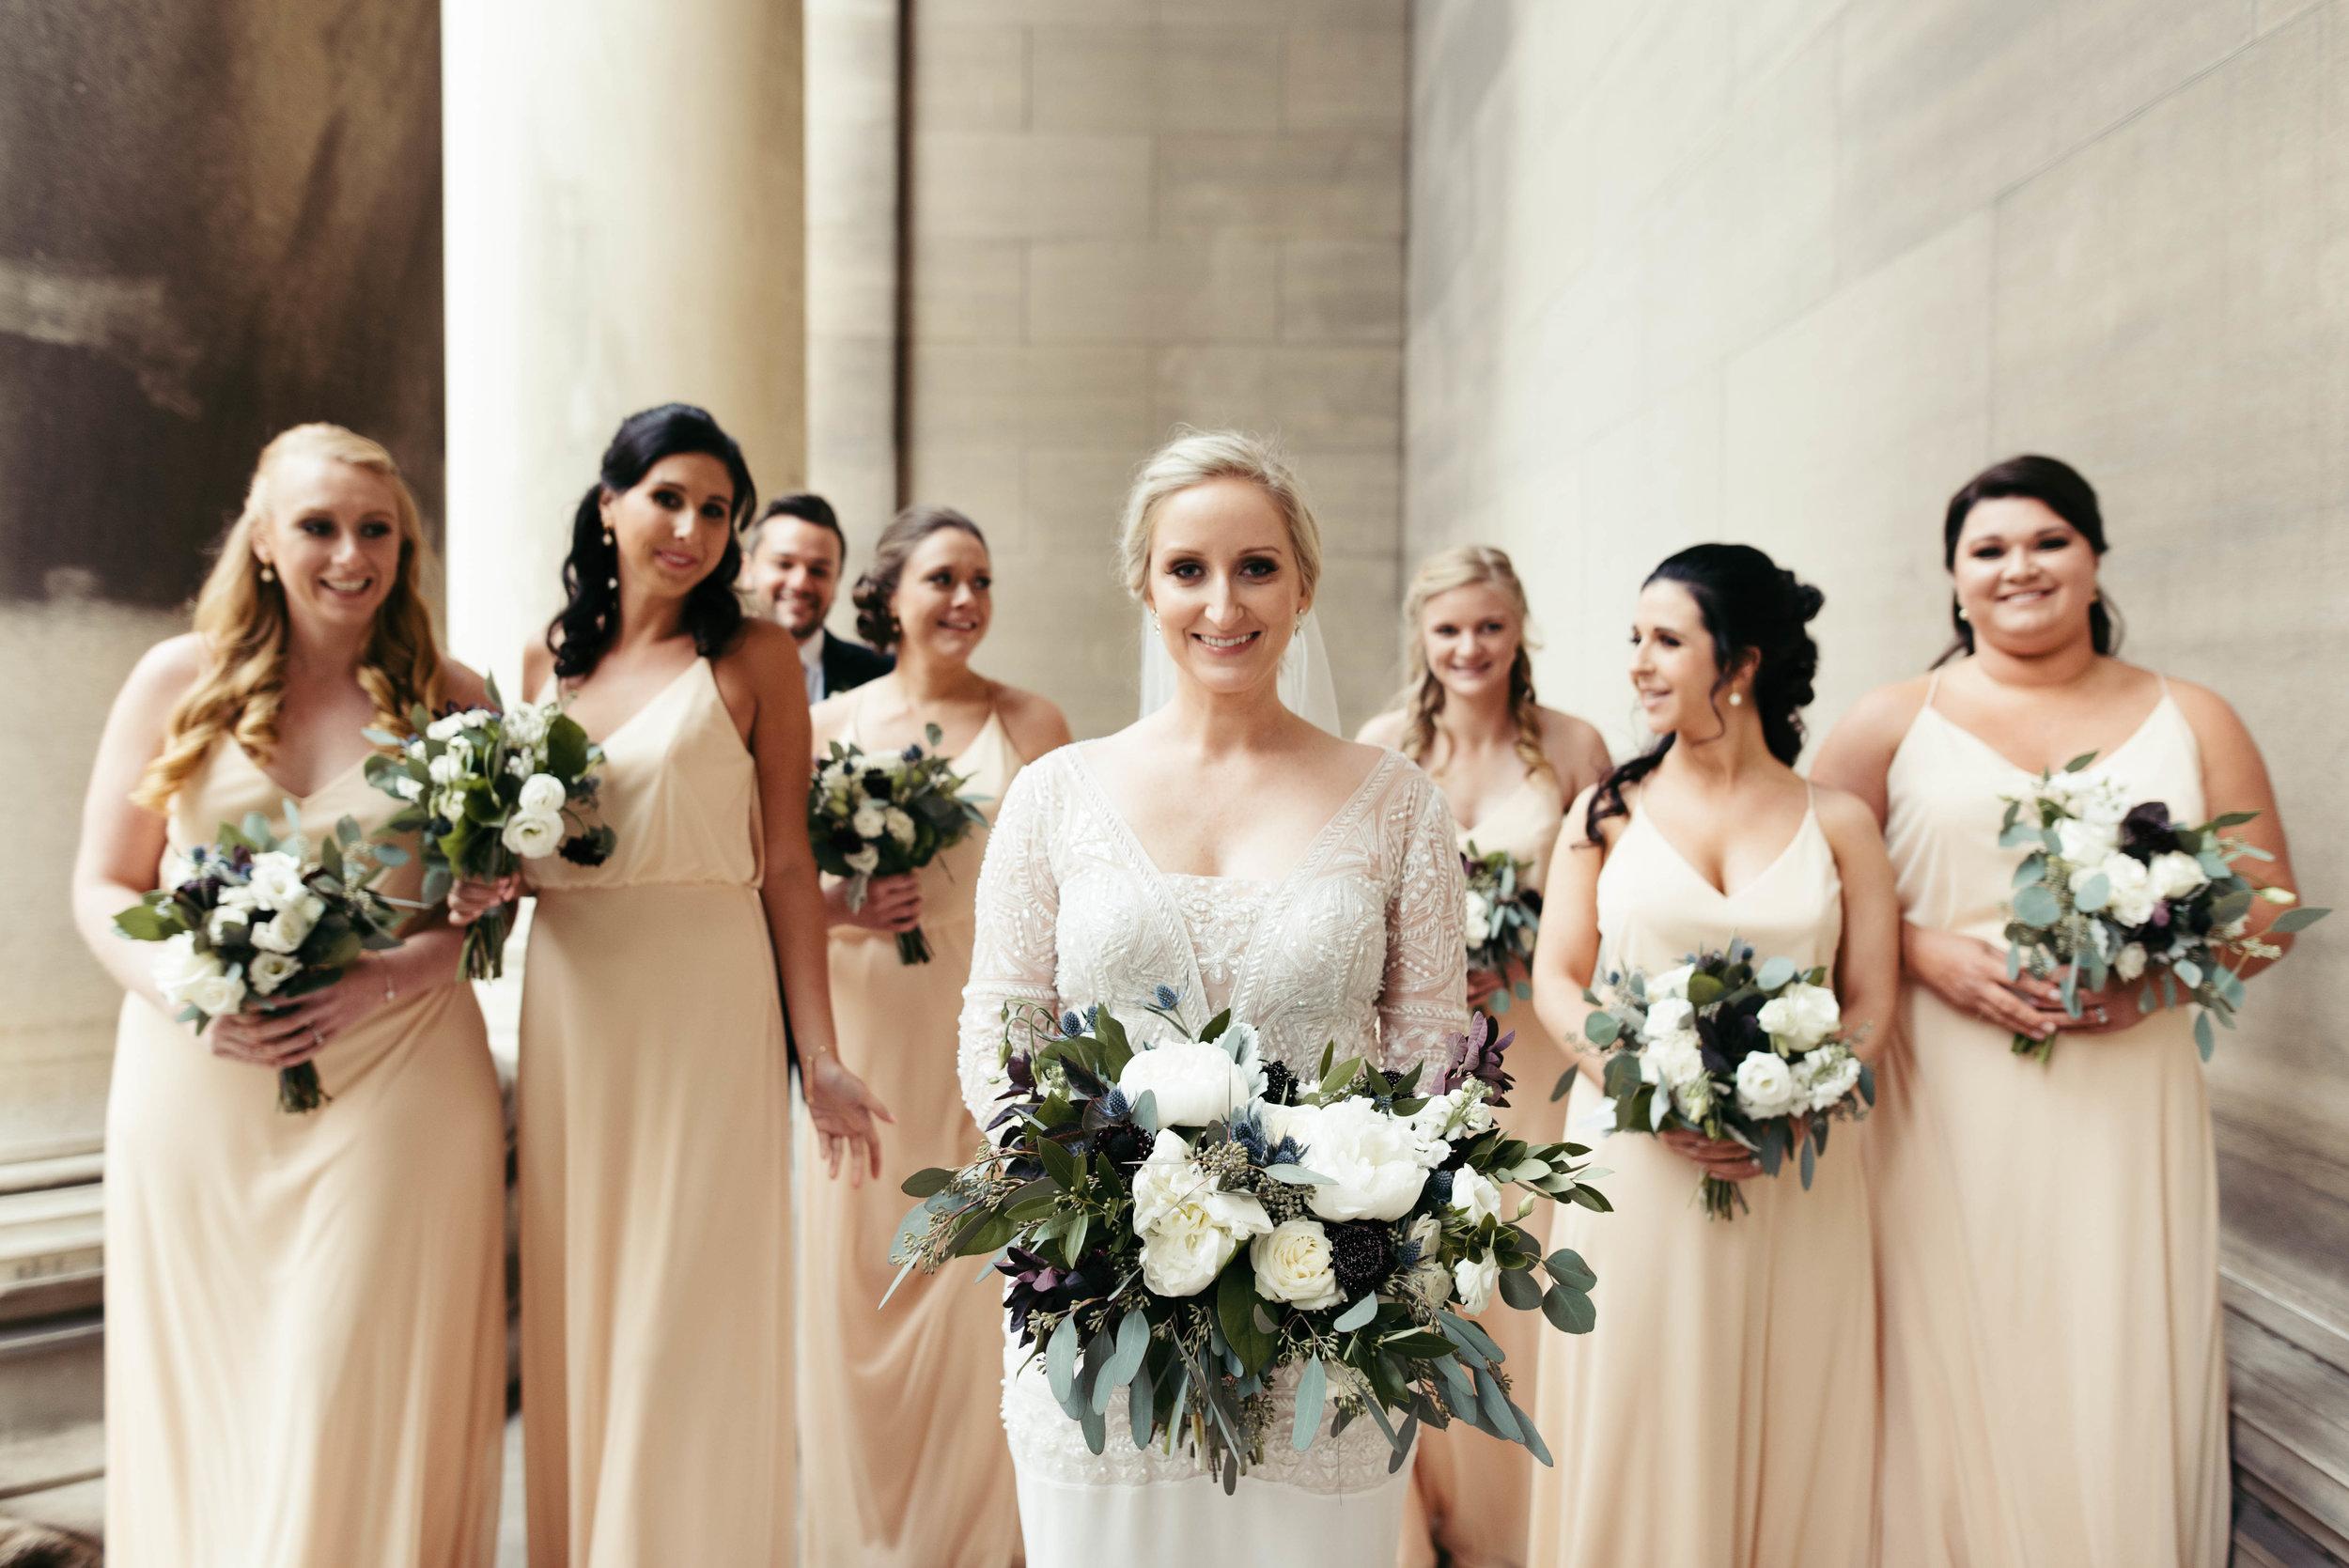 renaissance hotel wedding photos-19.jpg